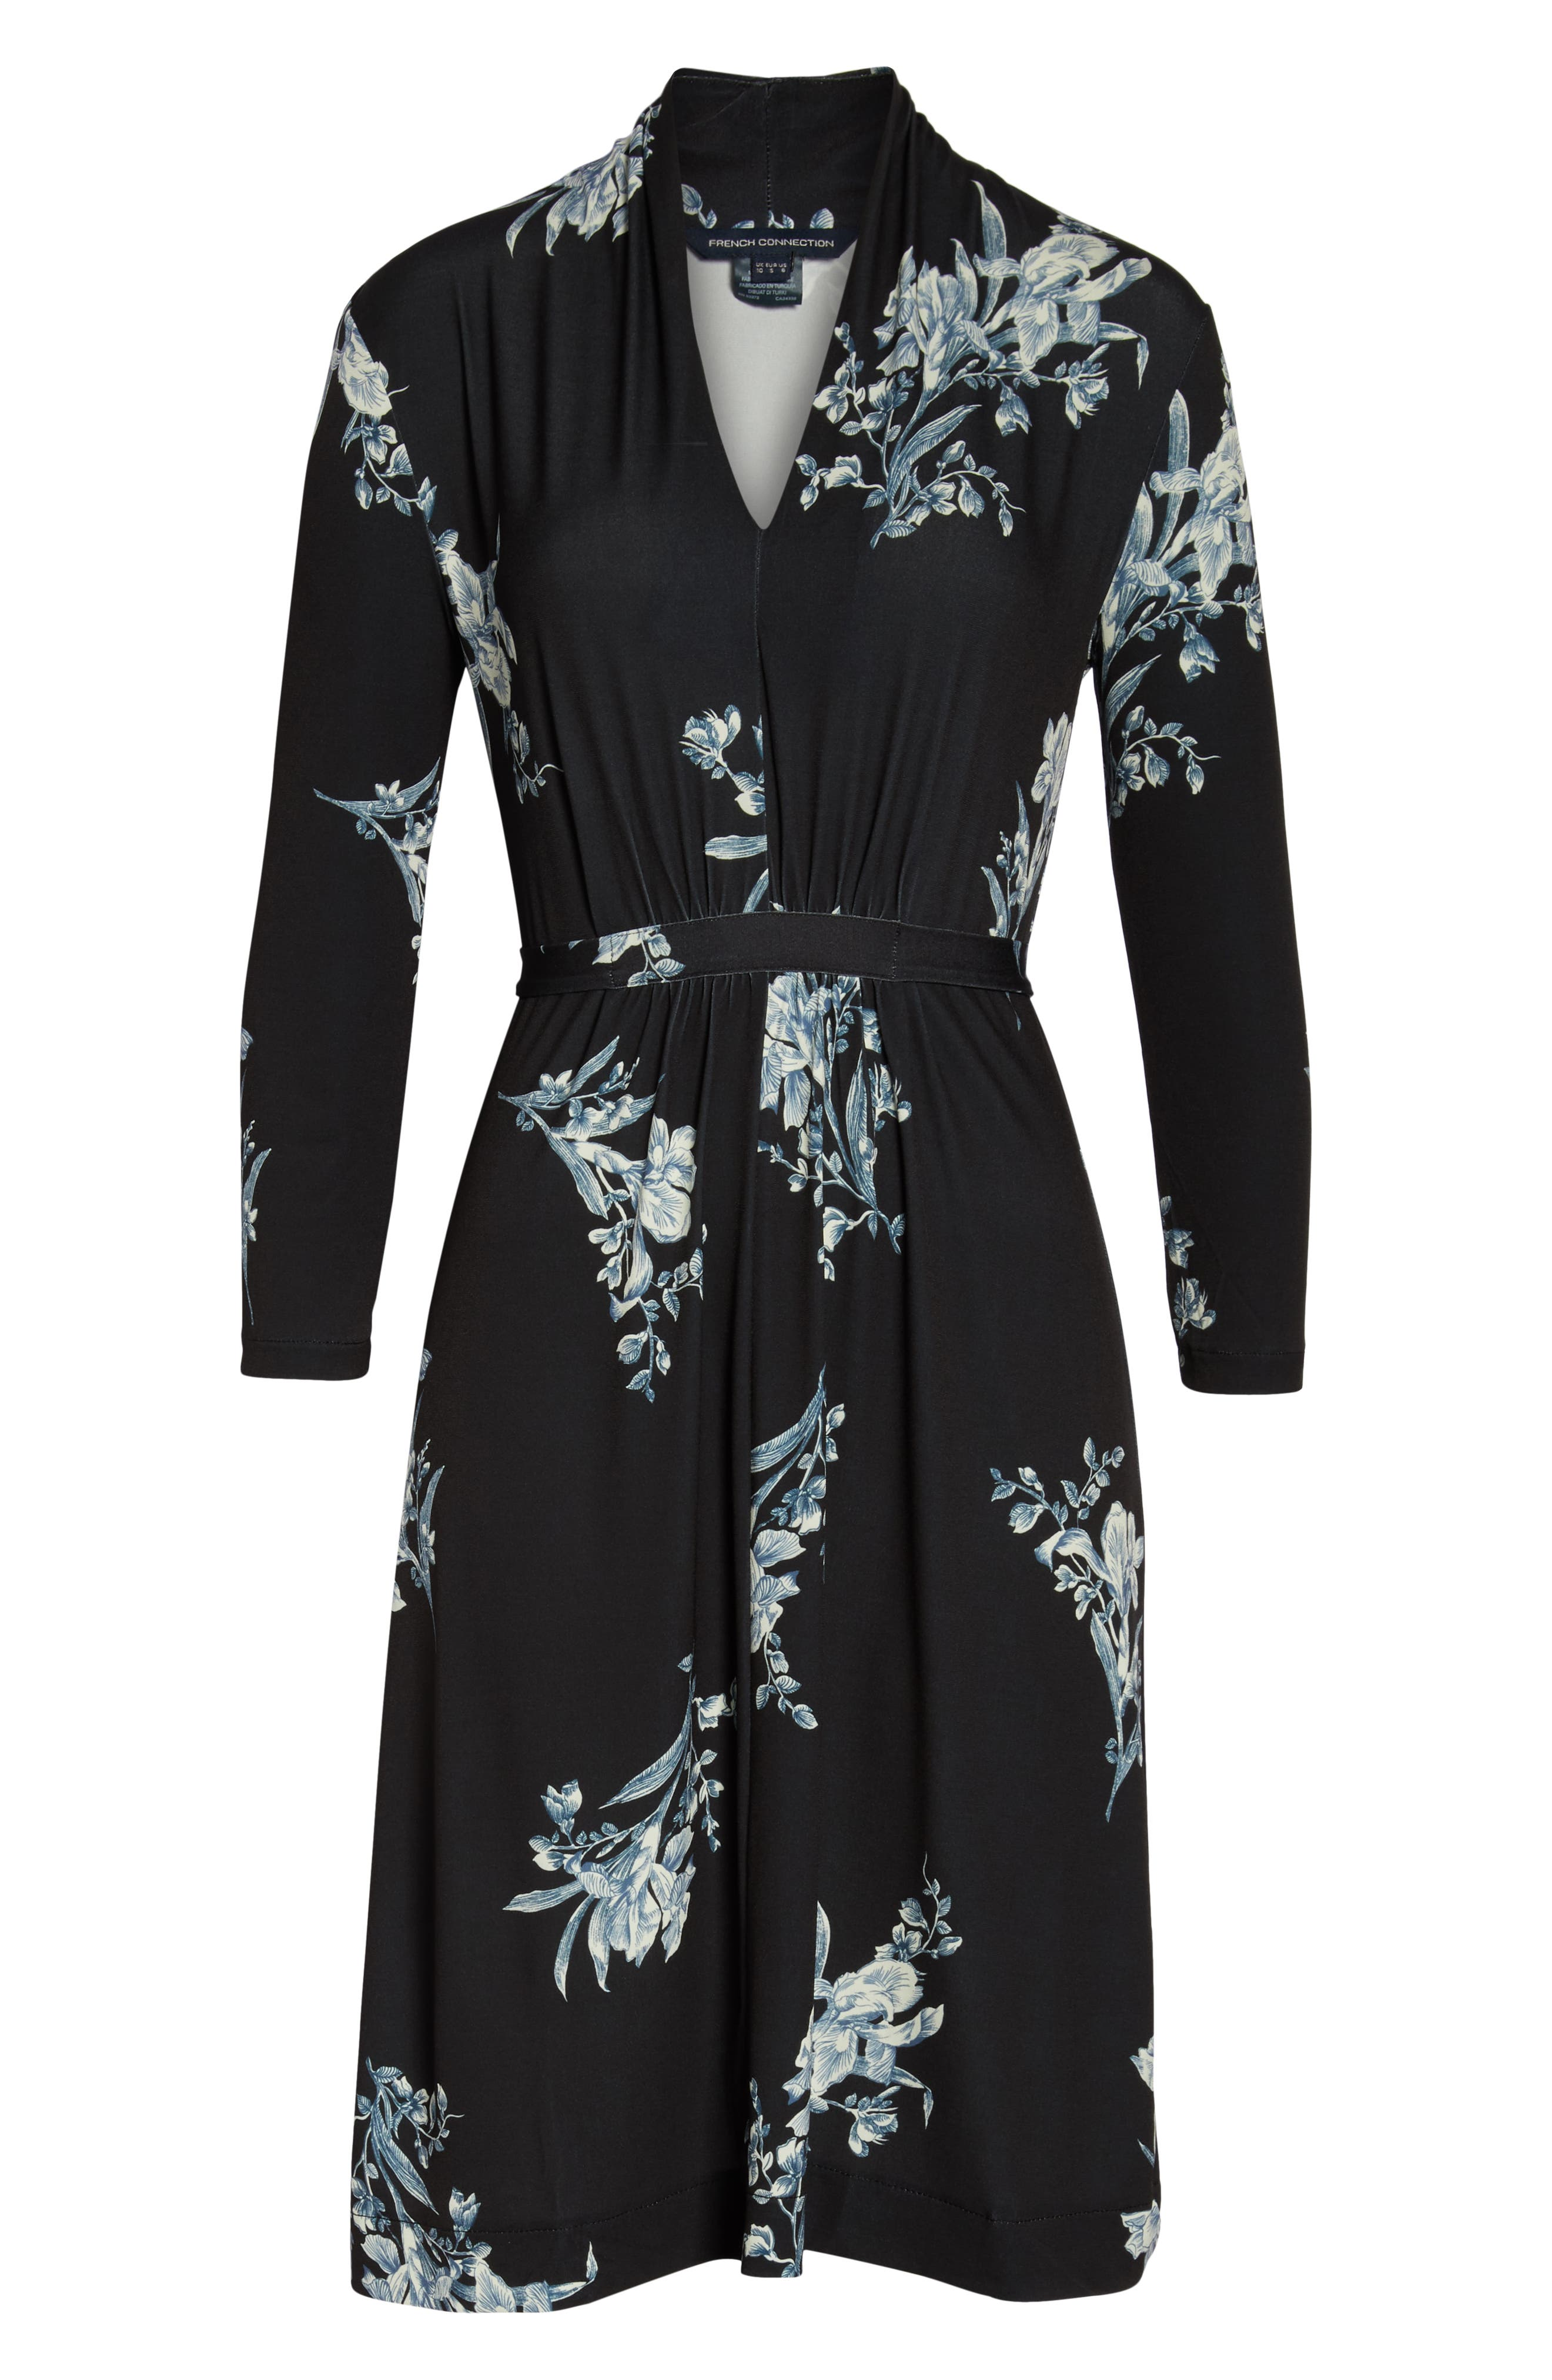 FRENCH CONNECTION, Laila Floral Print Dress, Alternate thumbnail 7, color, BLACK MULTI